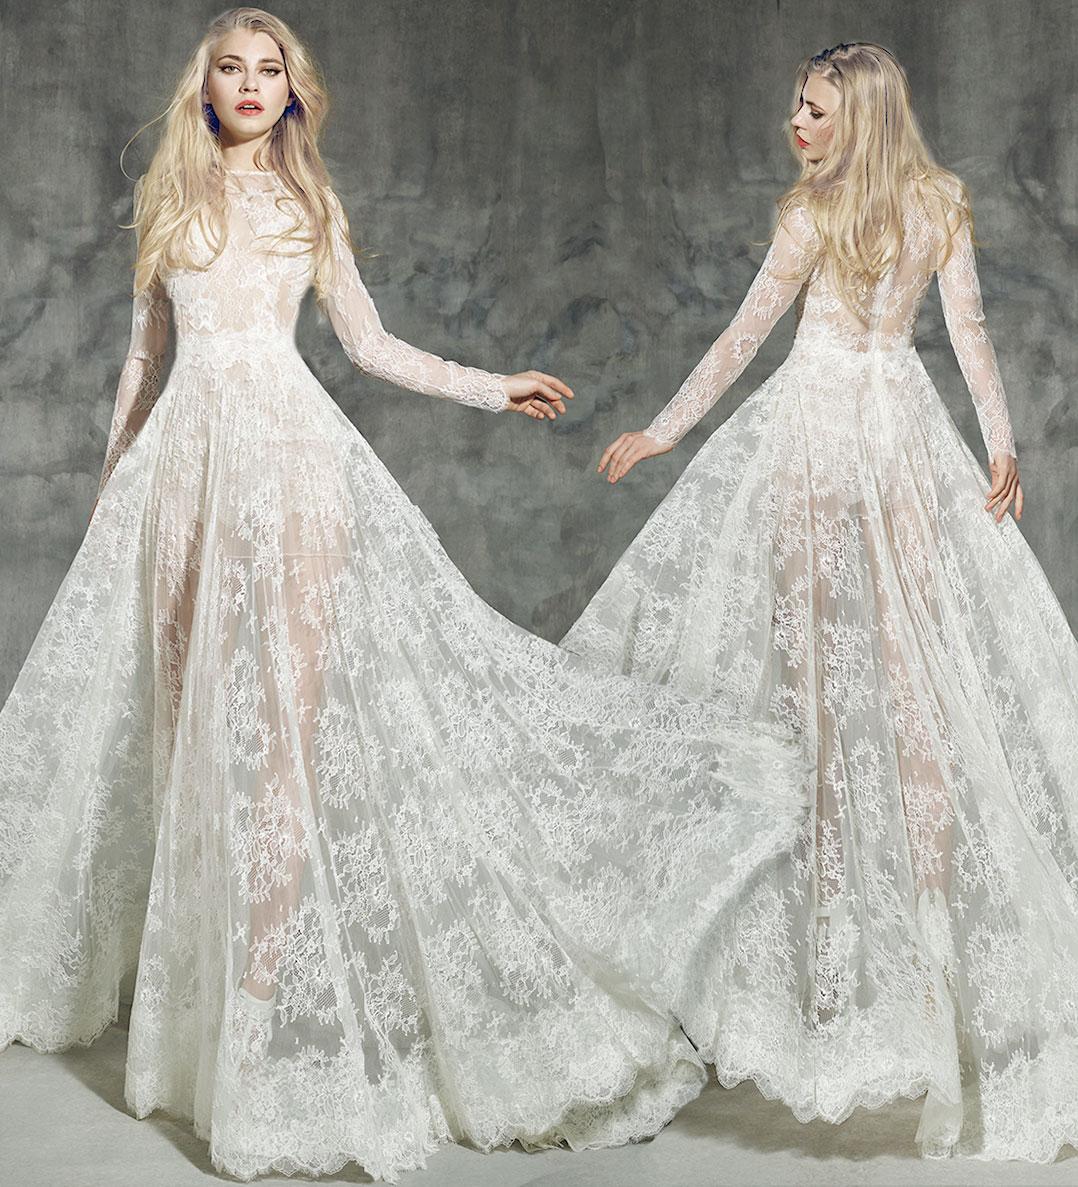 winter wedding dresses 2016 photo - 1